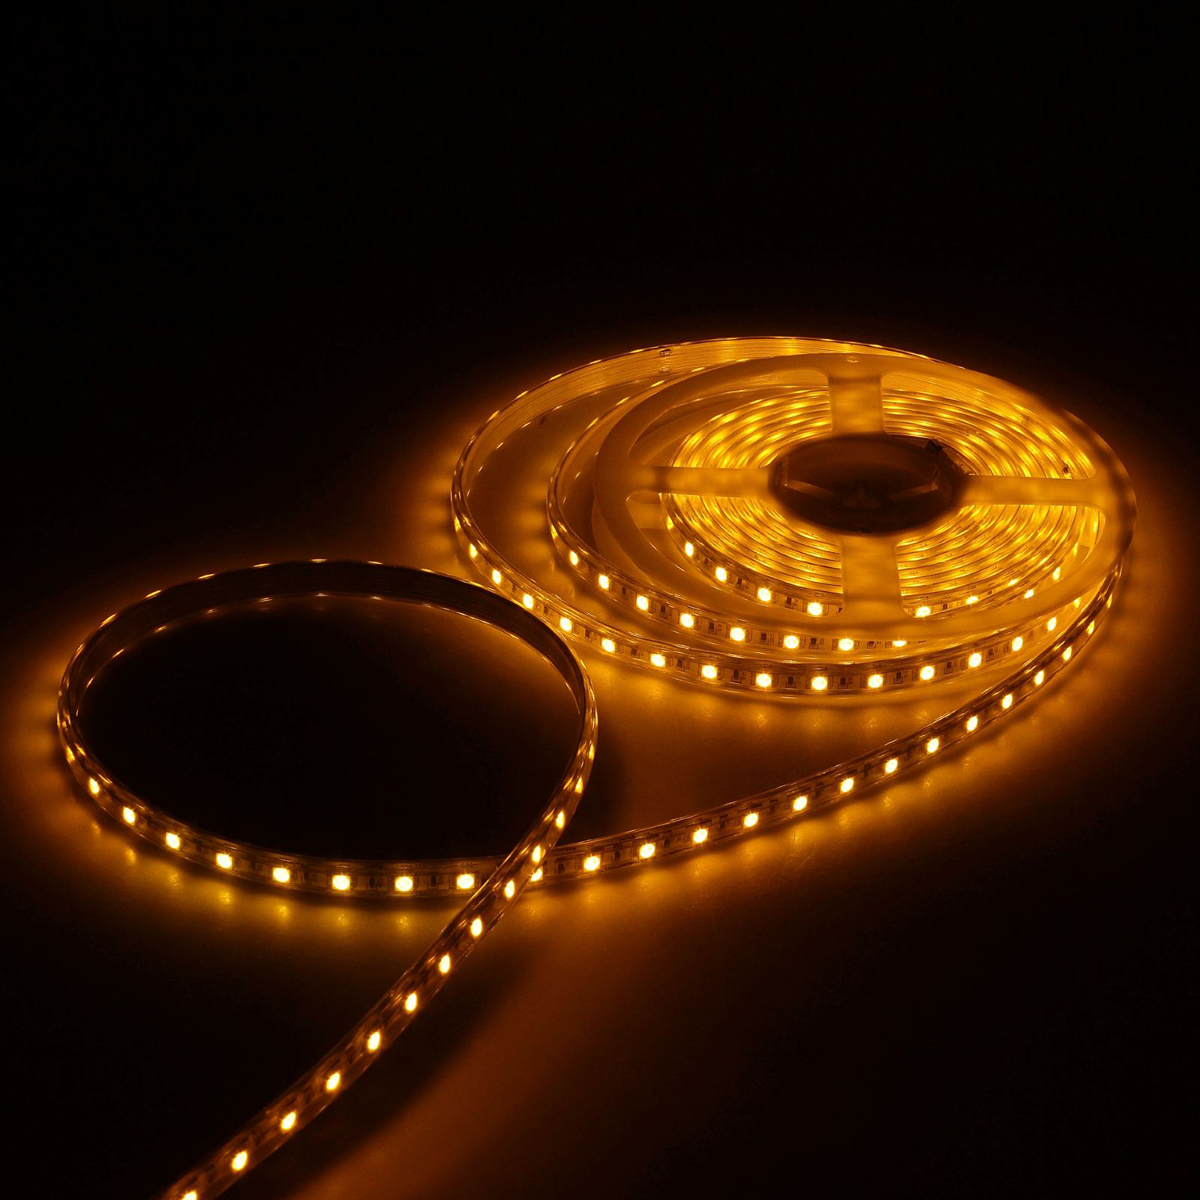 Светодиодная лента Luazon, 220В, SMD5050, длина 5 м, IP65, 60 LED ламп, 11 Вт/м, 16-18 Лм/1 LED, AC, цвет: желтый картридж cactus cs d115l black для samsung sl m2620d m2820nd m2820dw 3000 стр